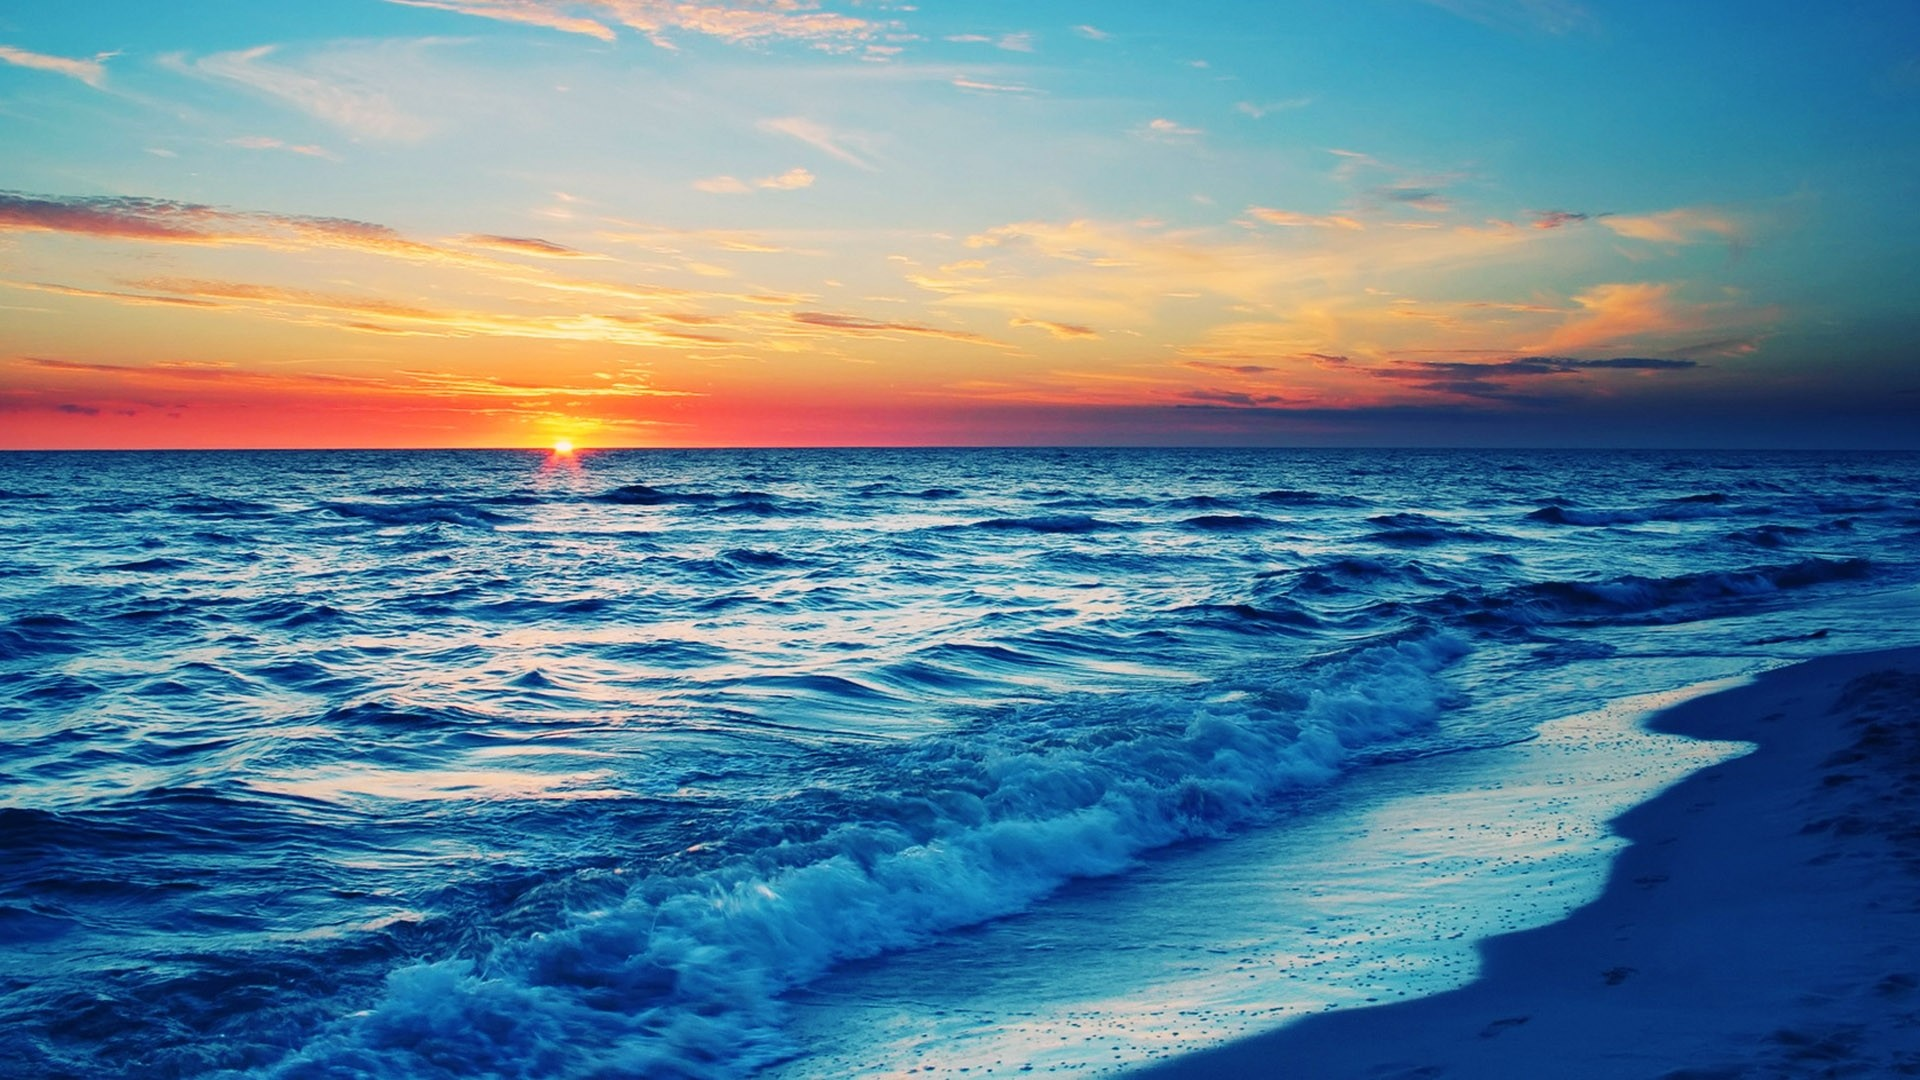 Fantastic Wallpaper Night Beach - 144294  Collection.jpg